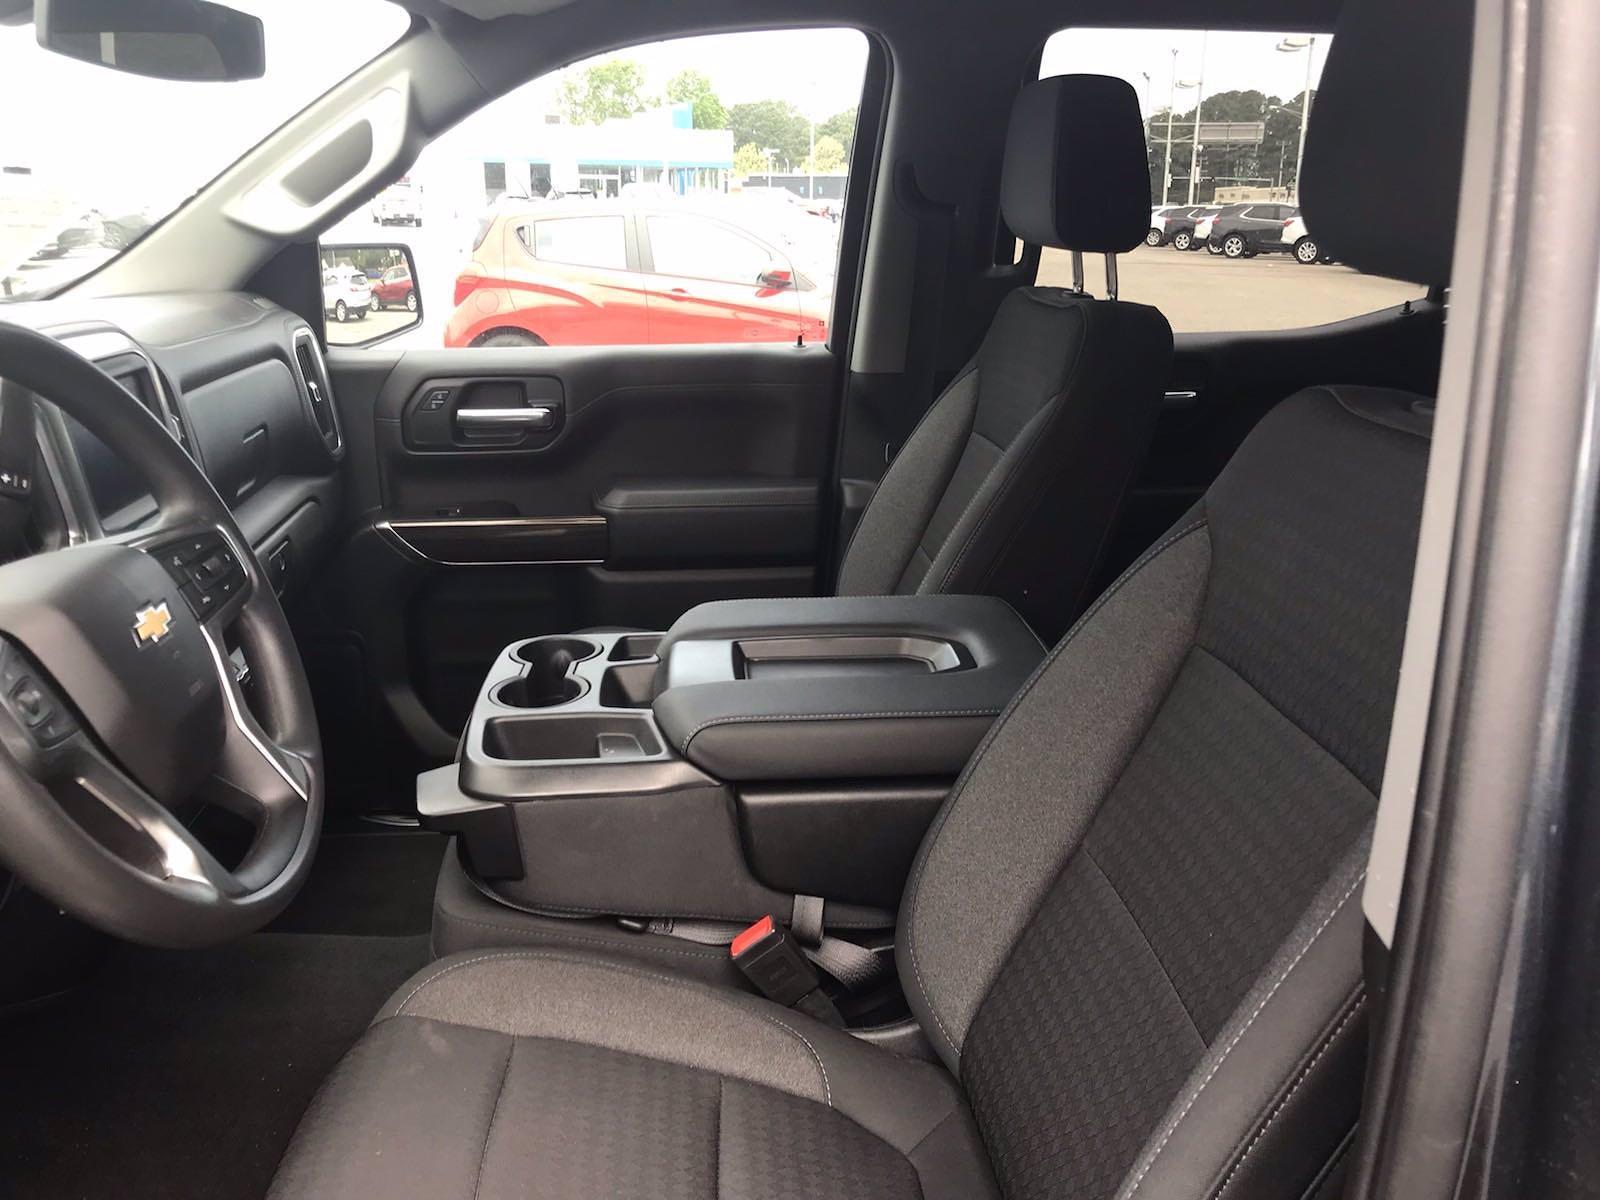 2020 Chevrolet Silverado 1500 Crew Cab 4x4, Pickup #16476PN - photo 23